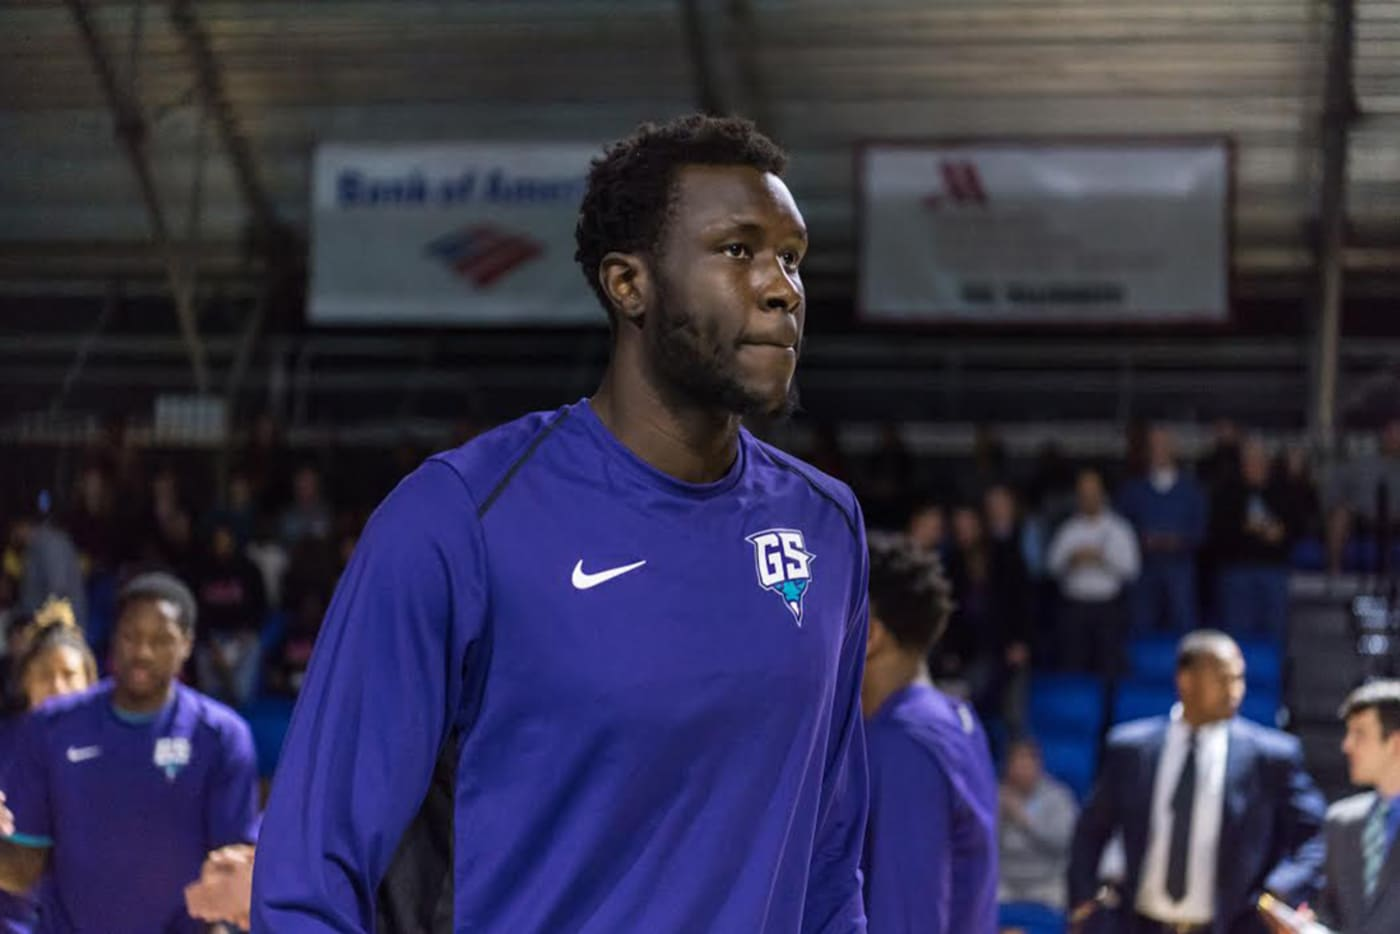 NBA prospect Mangok Mathiang. Photo courtesy of Greensboro Swarm.